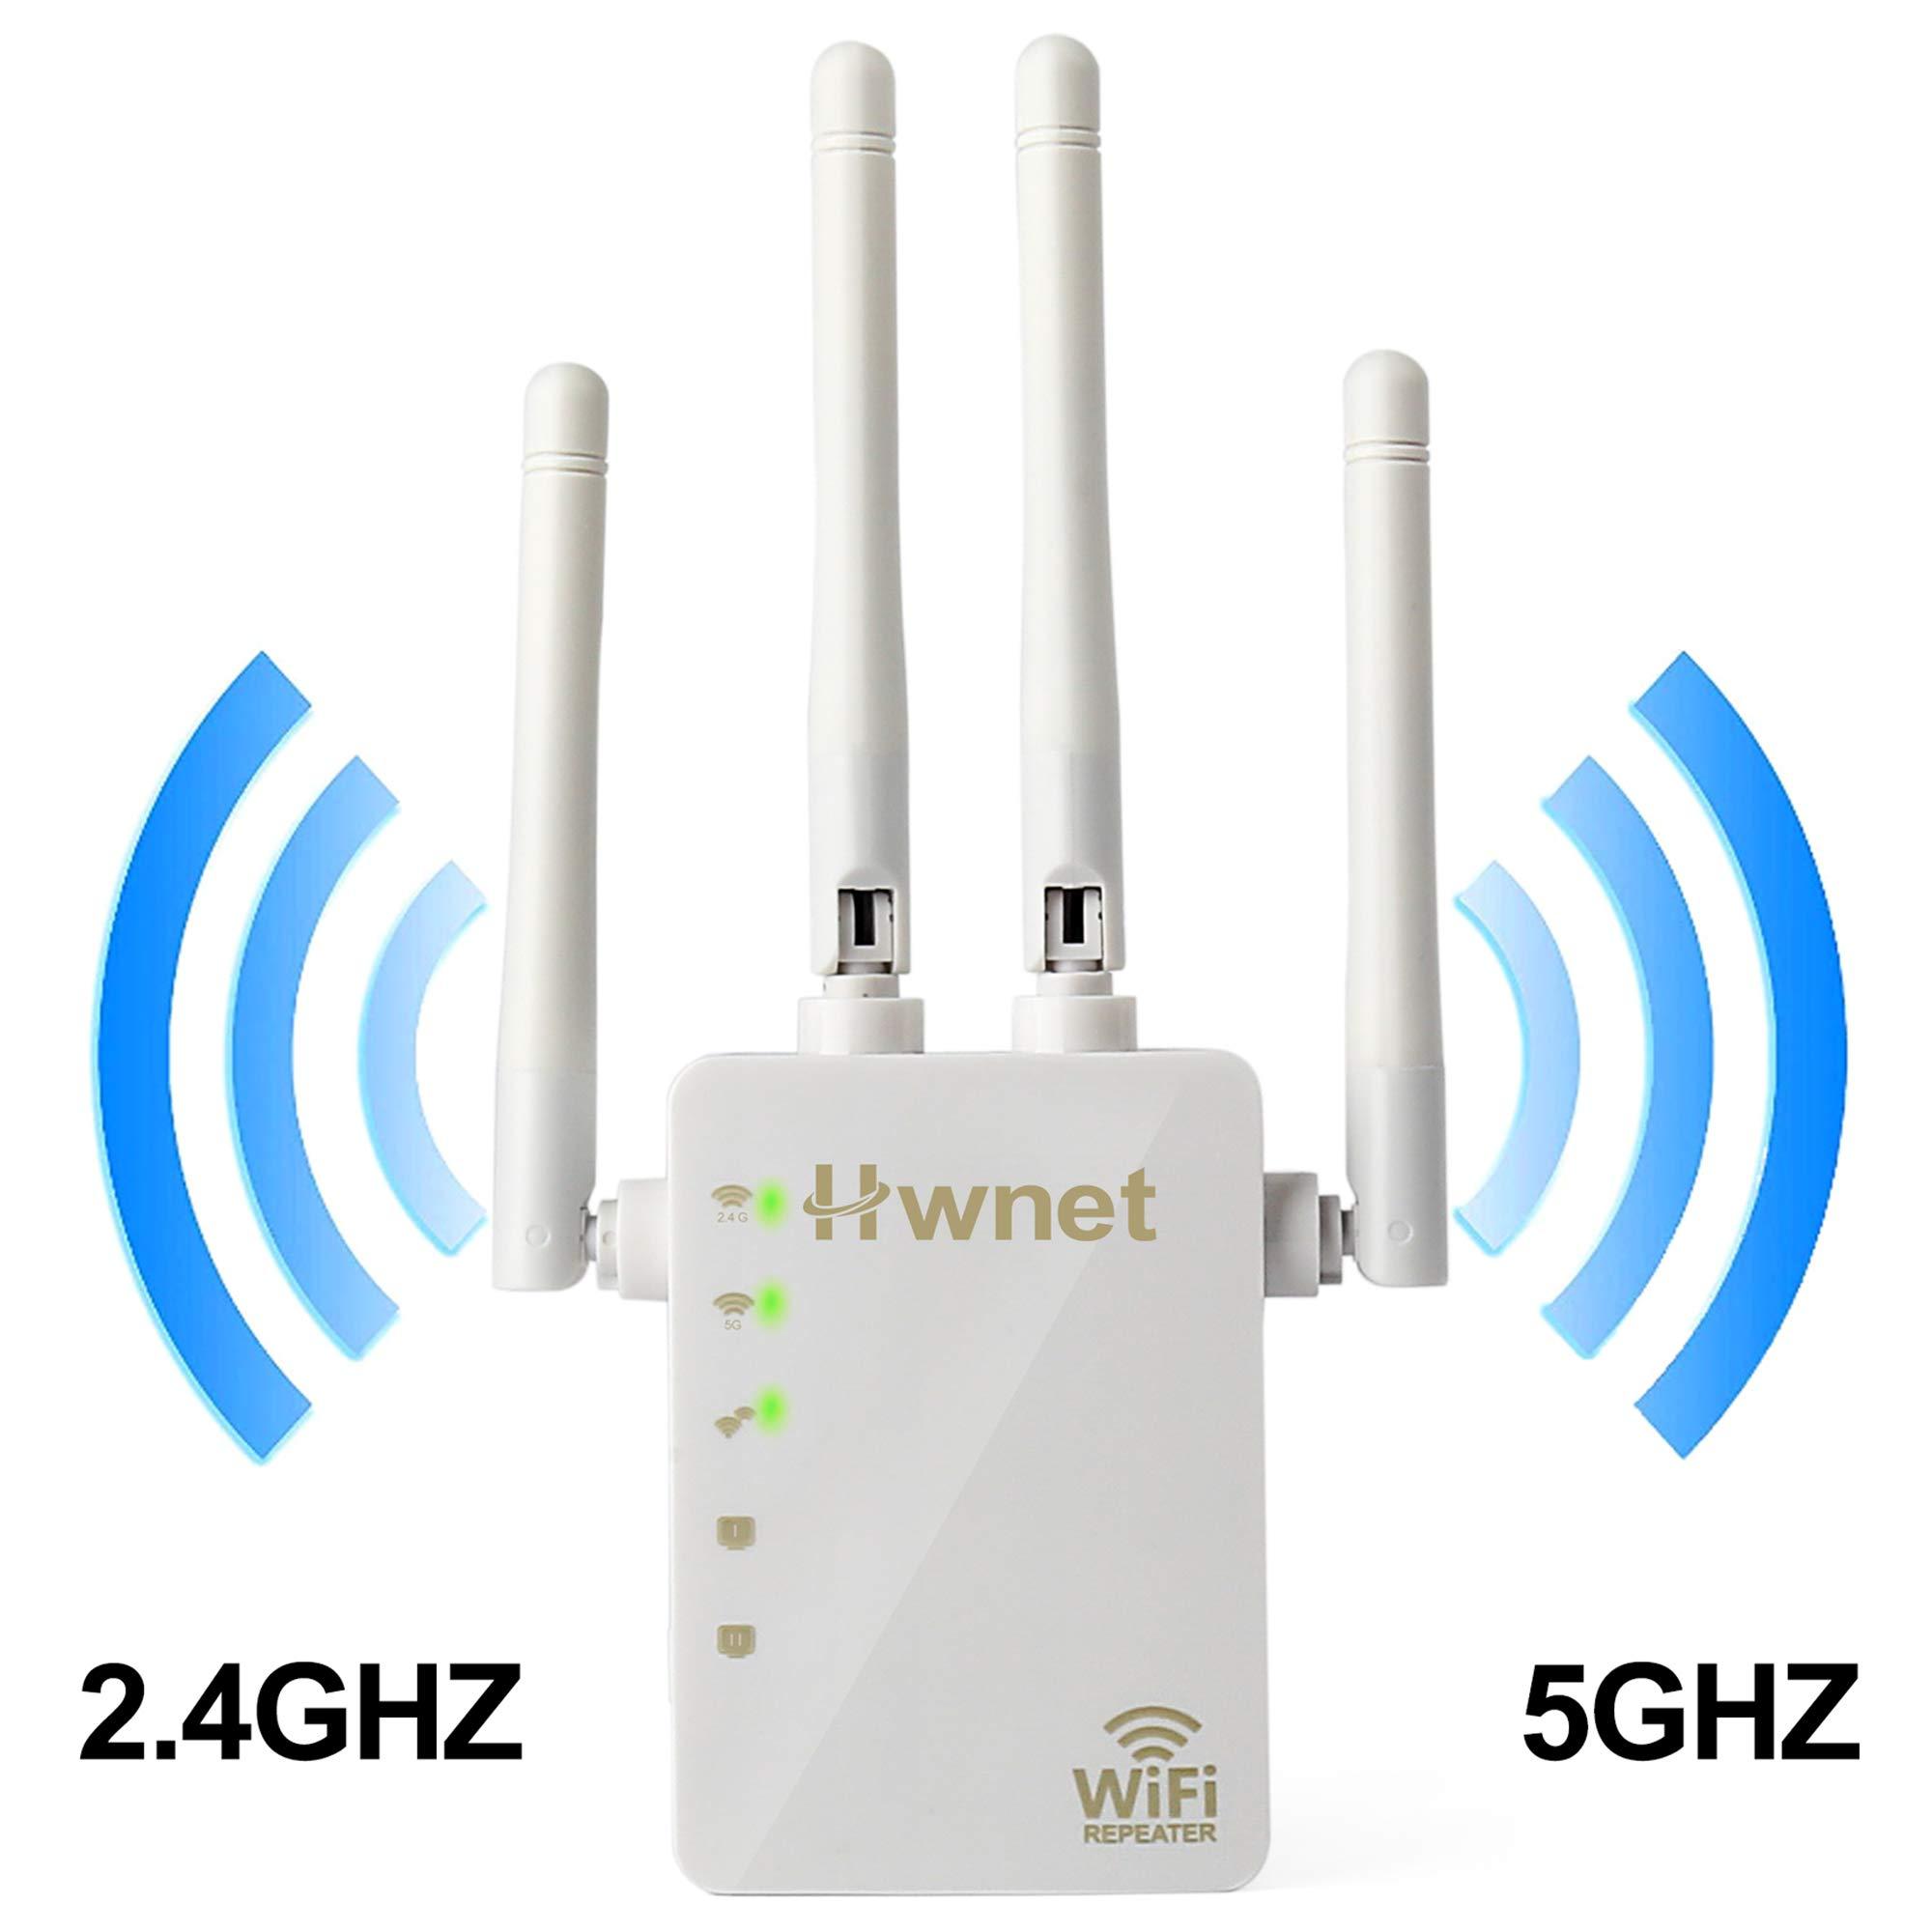 5GHz WiFi Range Extender Amplifier